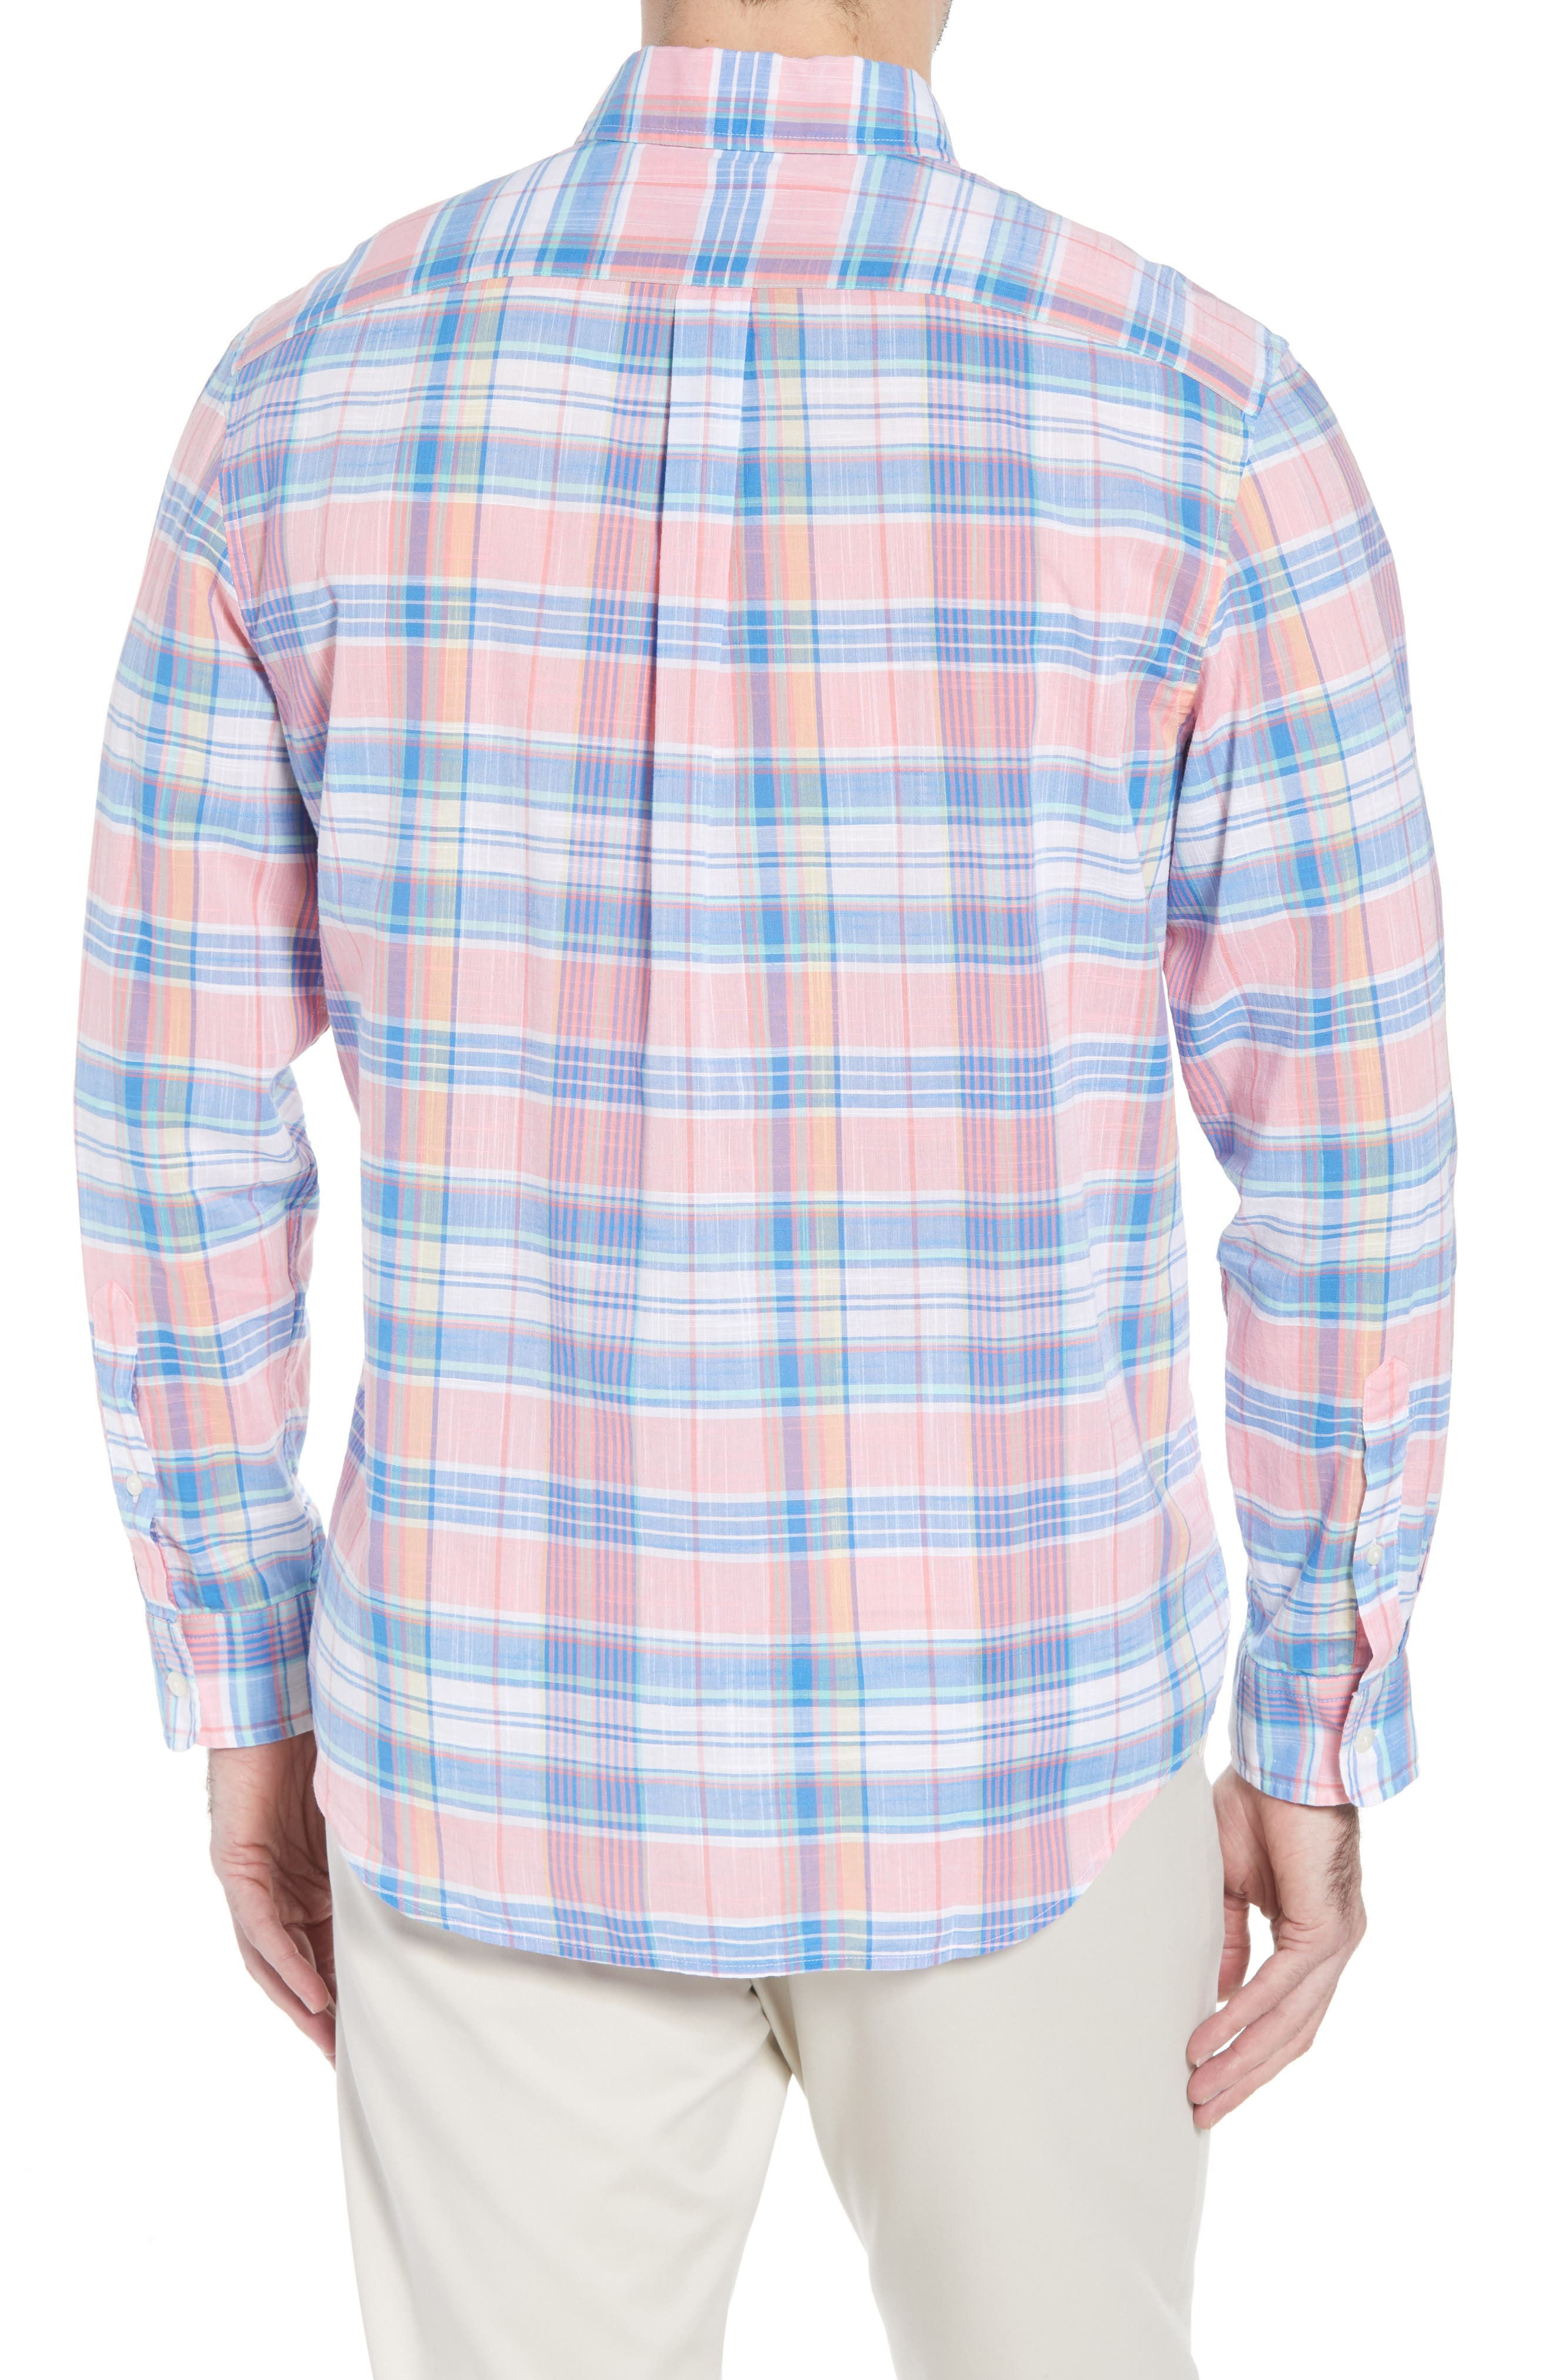 Smith Point Tucker Classic Fit Plaid Sport Shirt,                             Alternate thumbnail 4, color,